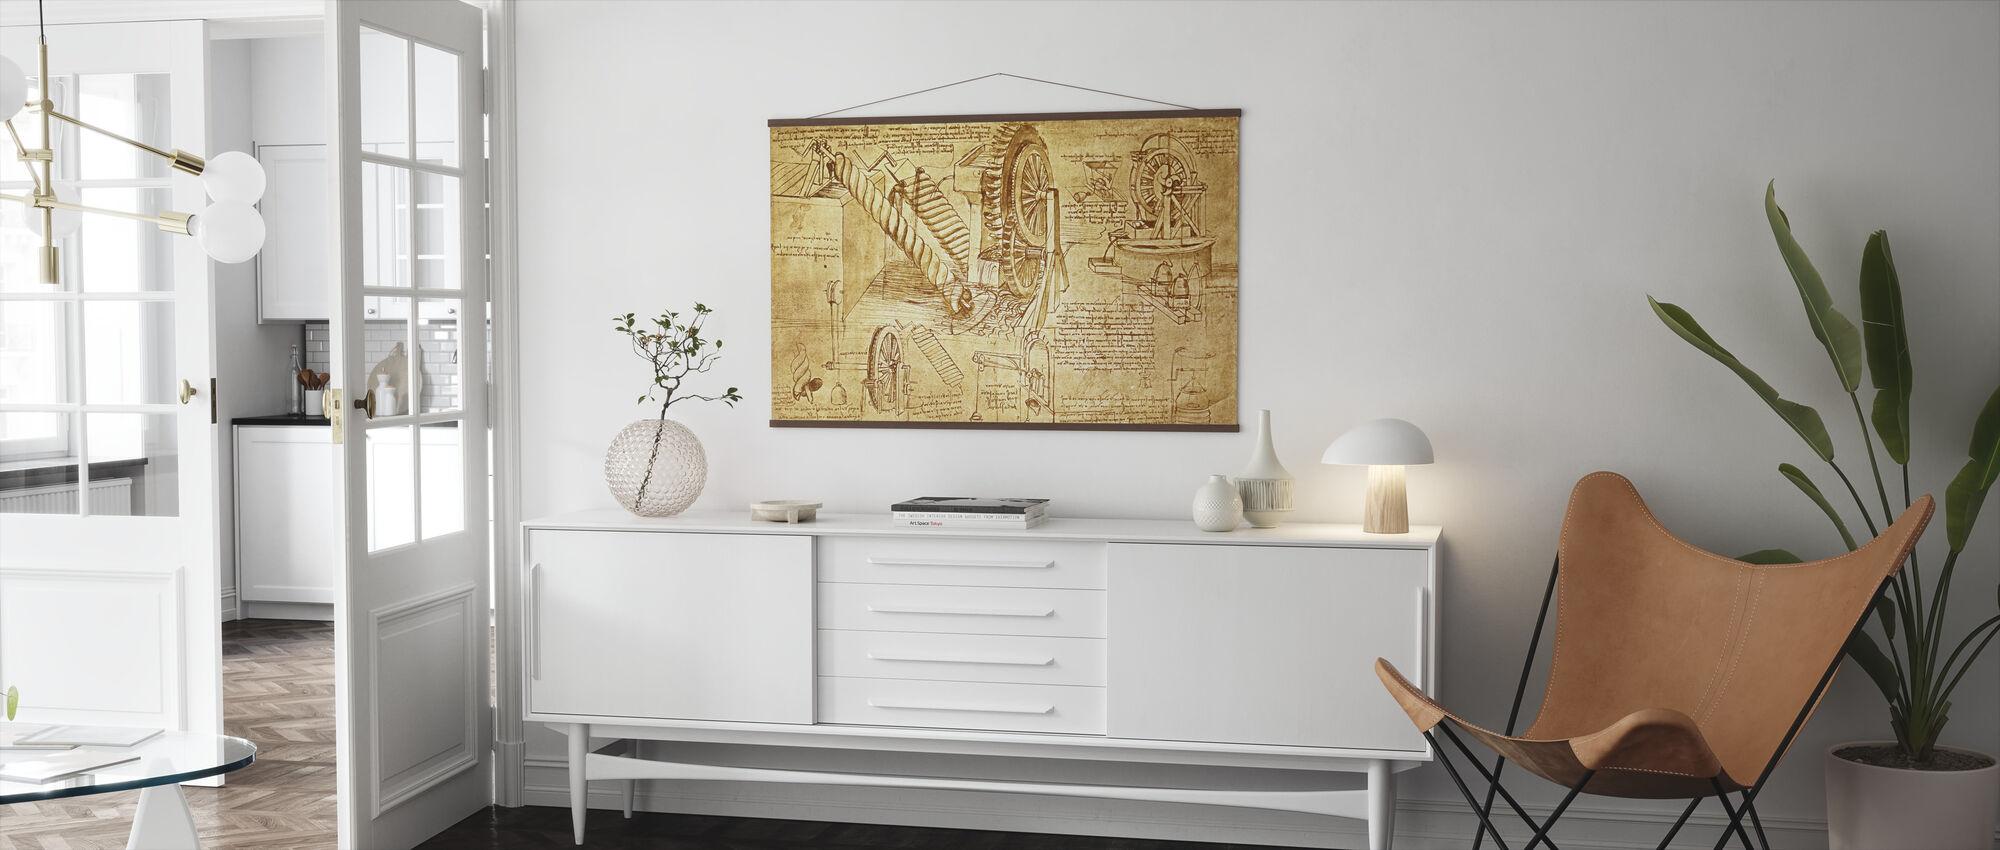 Leonardo da Vinci - Atlanticus - Plakat - Stue